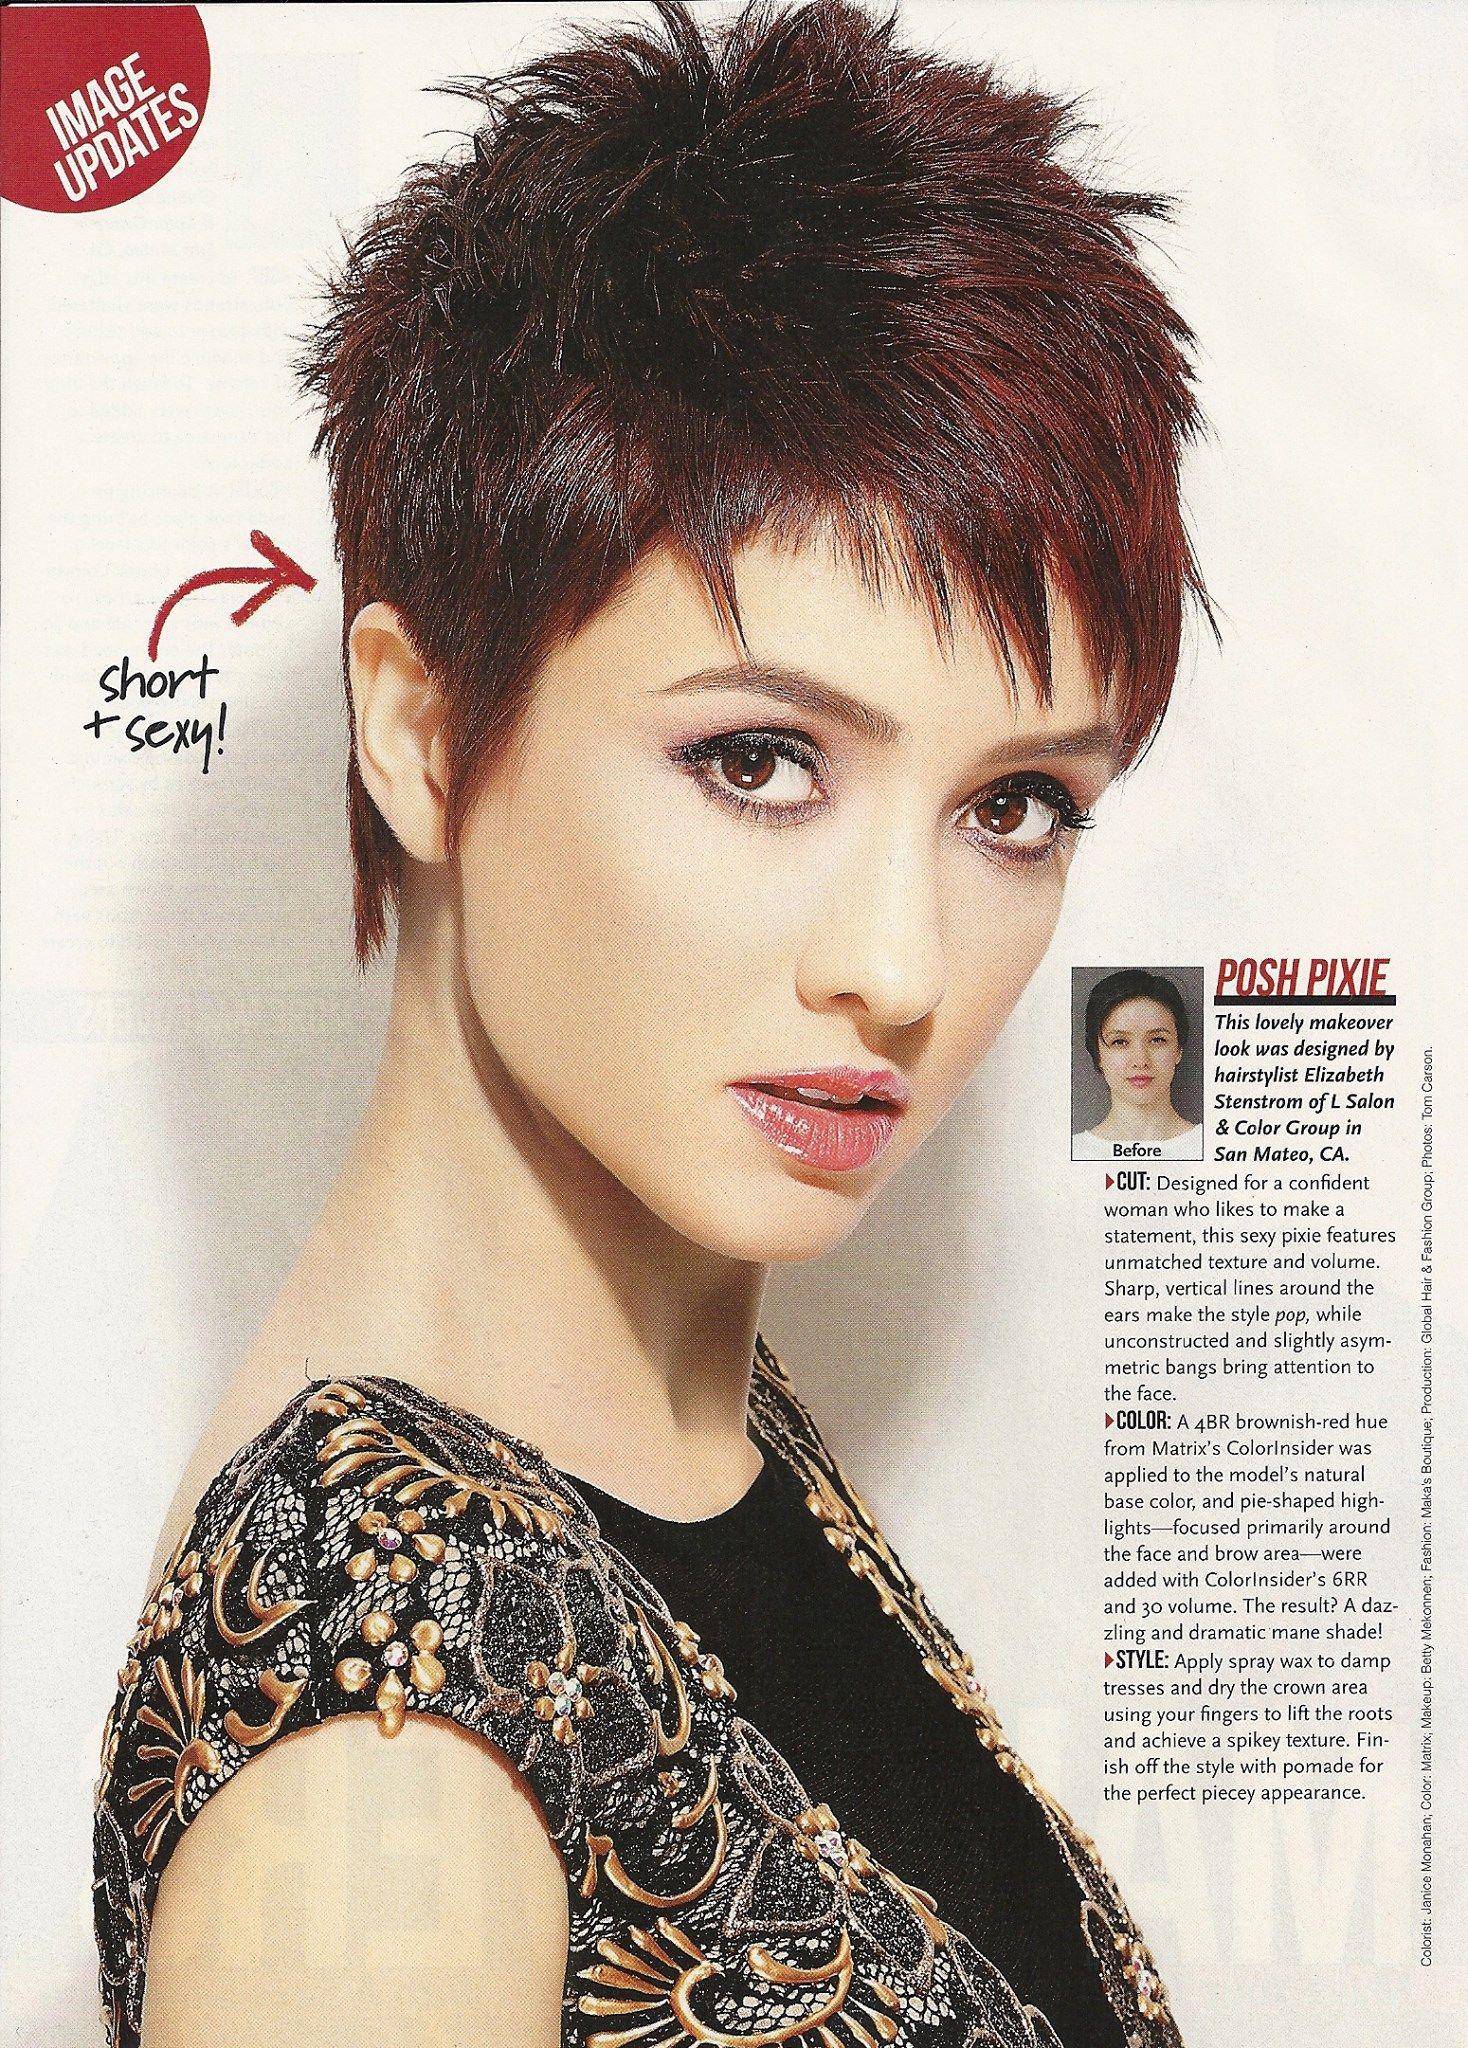 l salon's styles featured